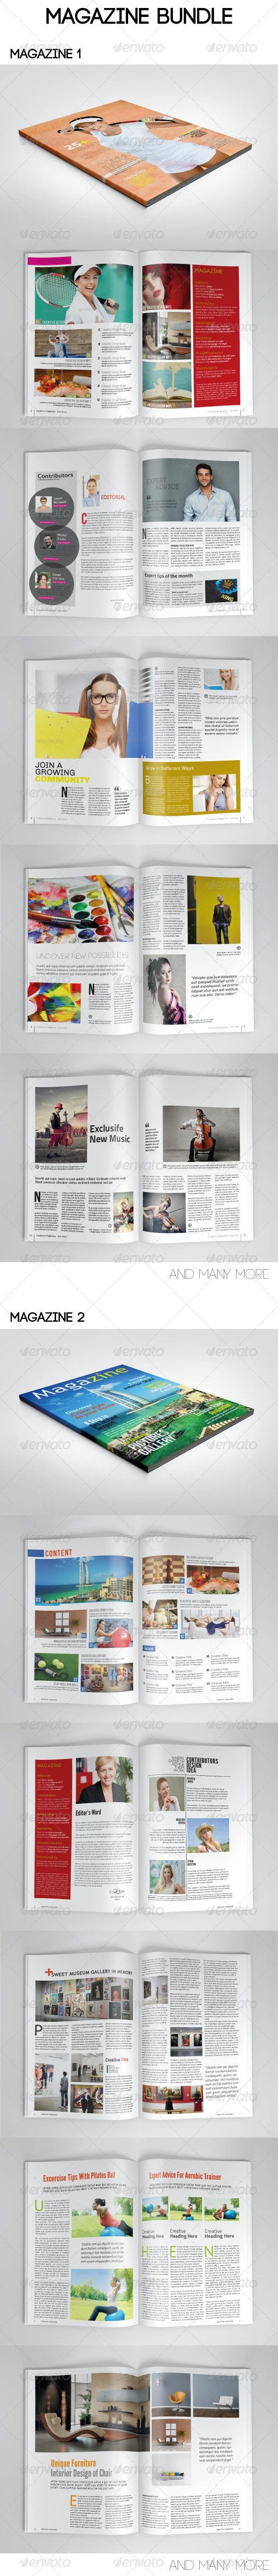 Magazine Bundle Vol. 02 - Magazines Print Templates